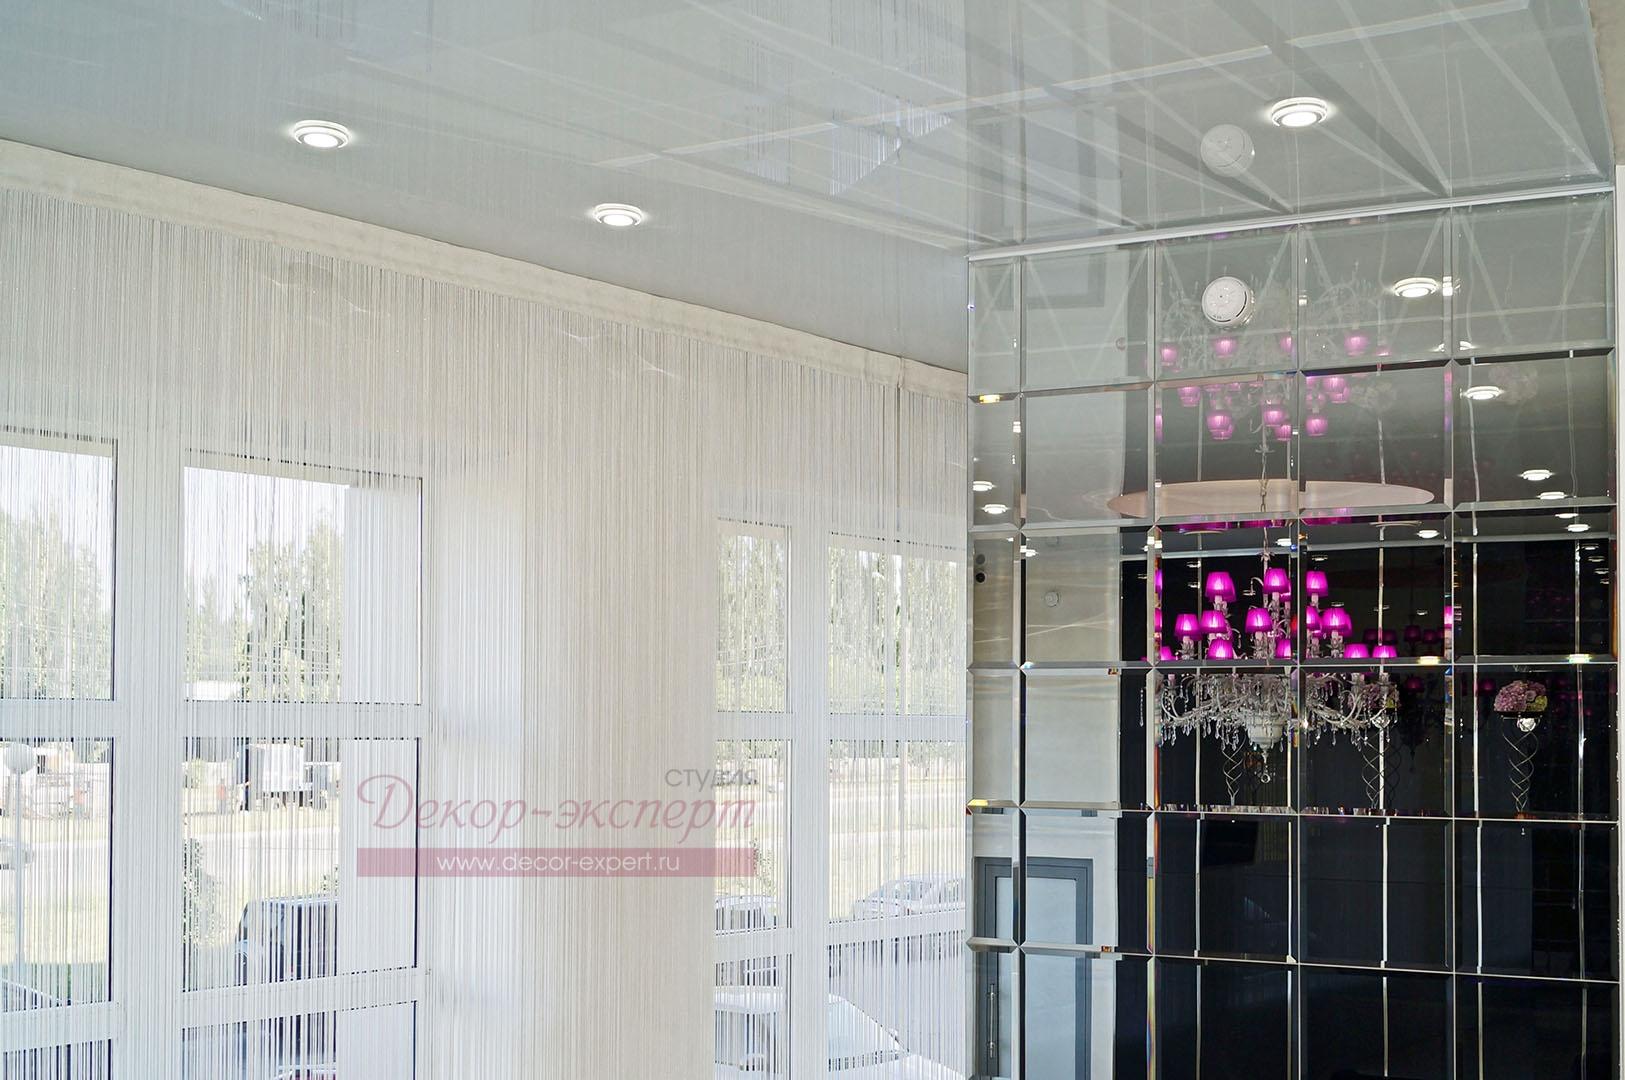 kiseya-foto-v-interiere-salona-krasoti-4